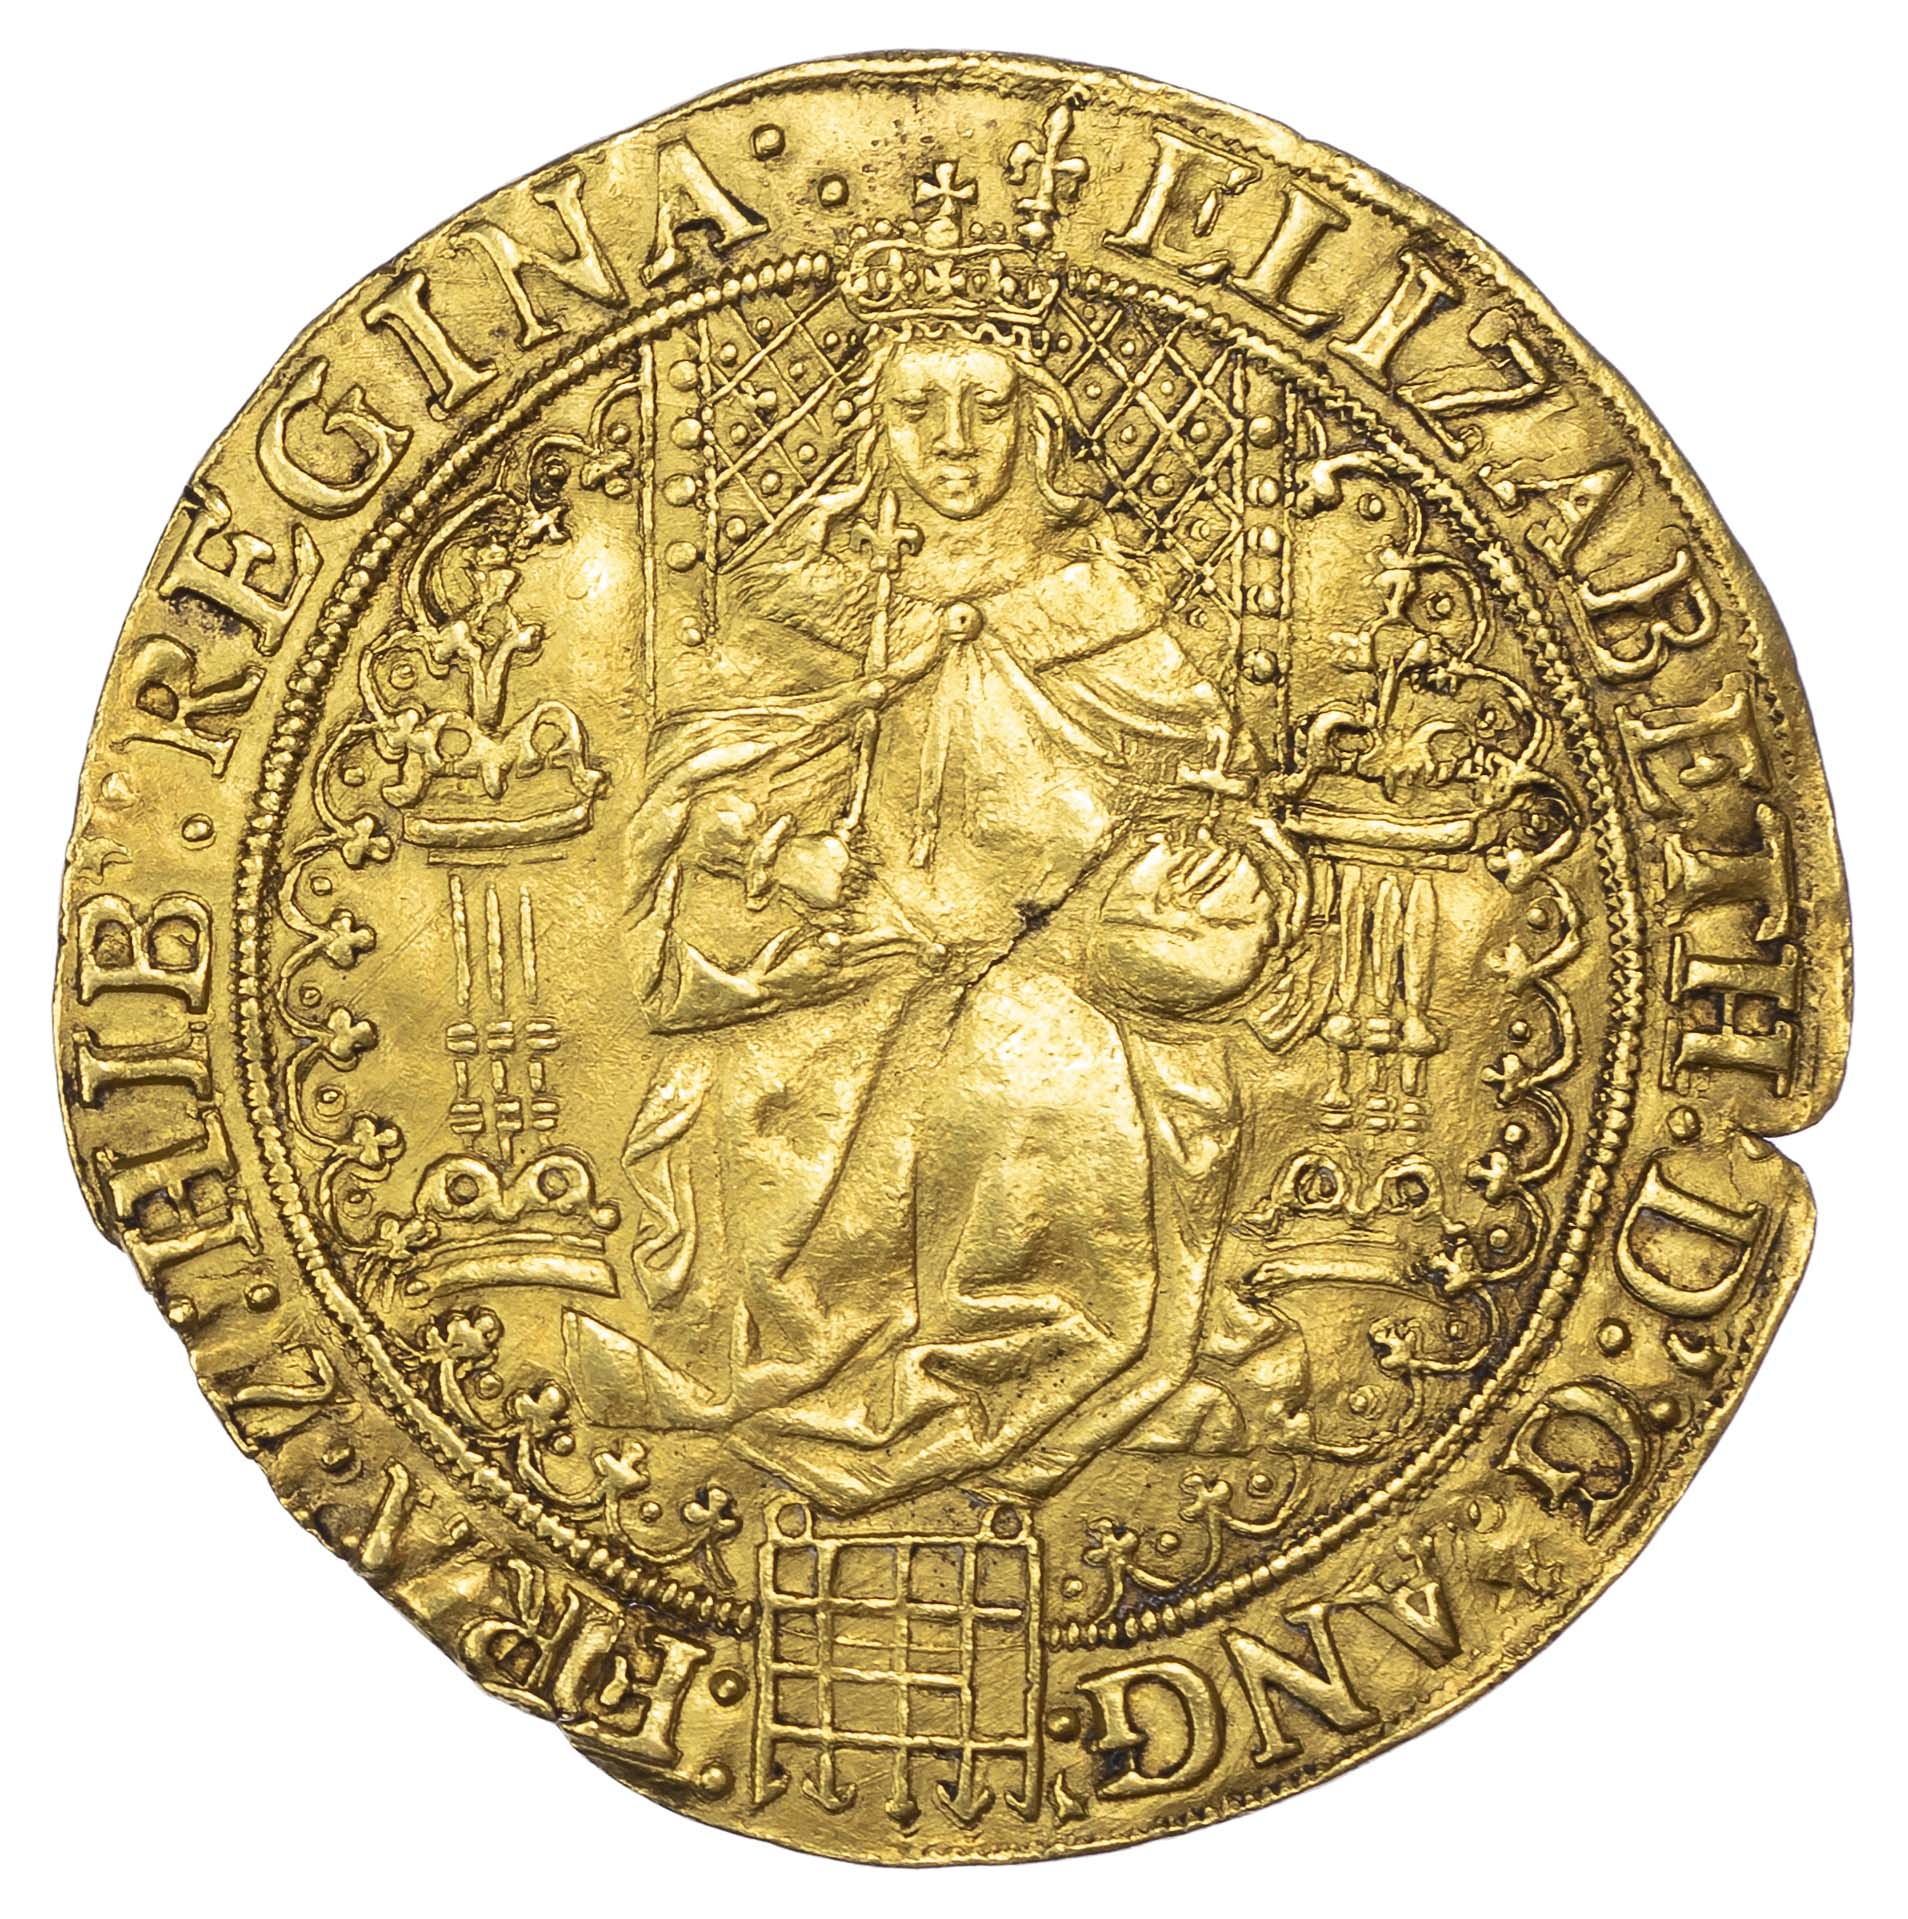 Elizabeth I (1558-1603), fine Gold Sovereign, first issue, mm. lis